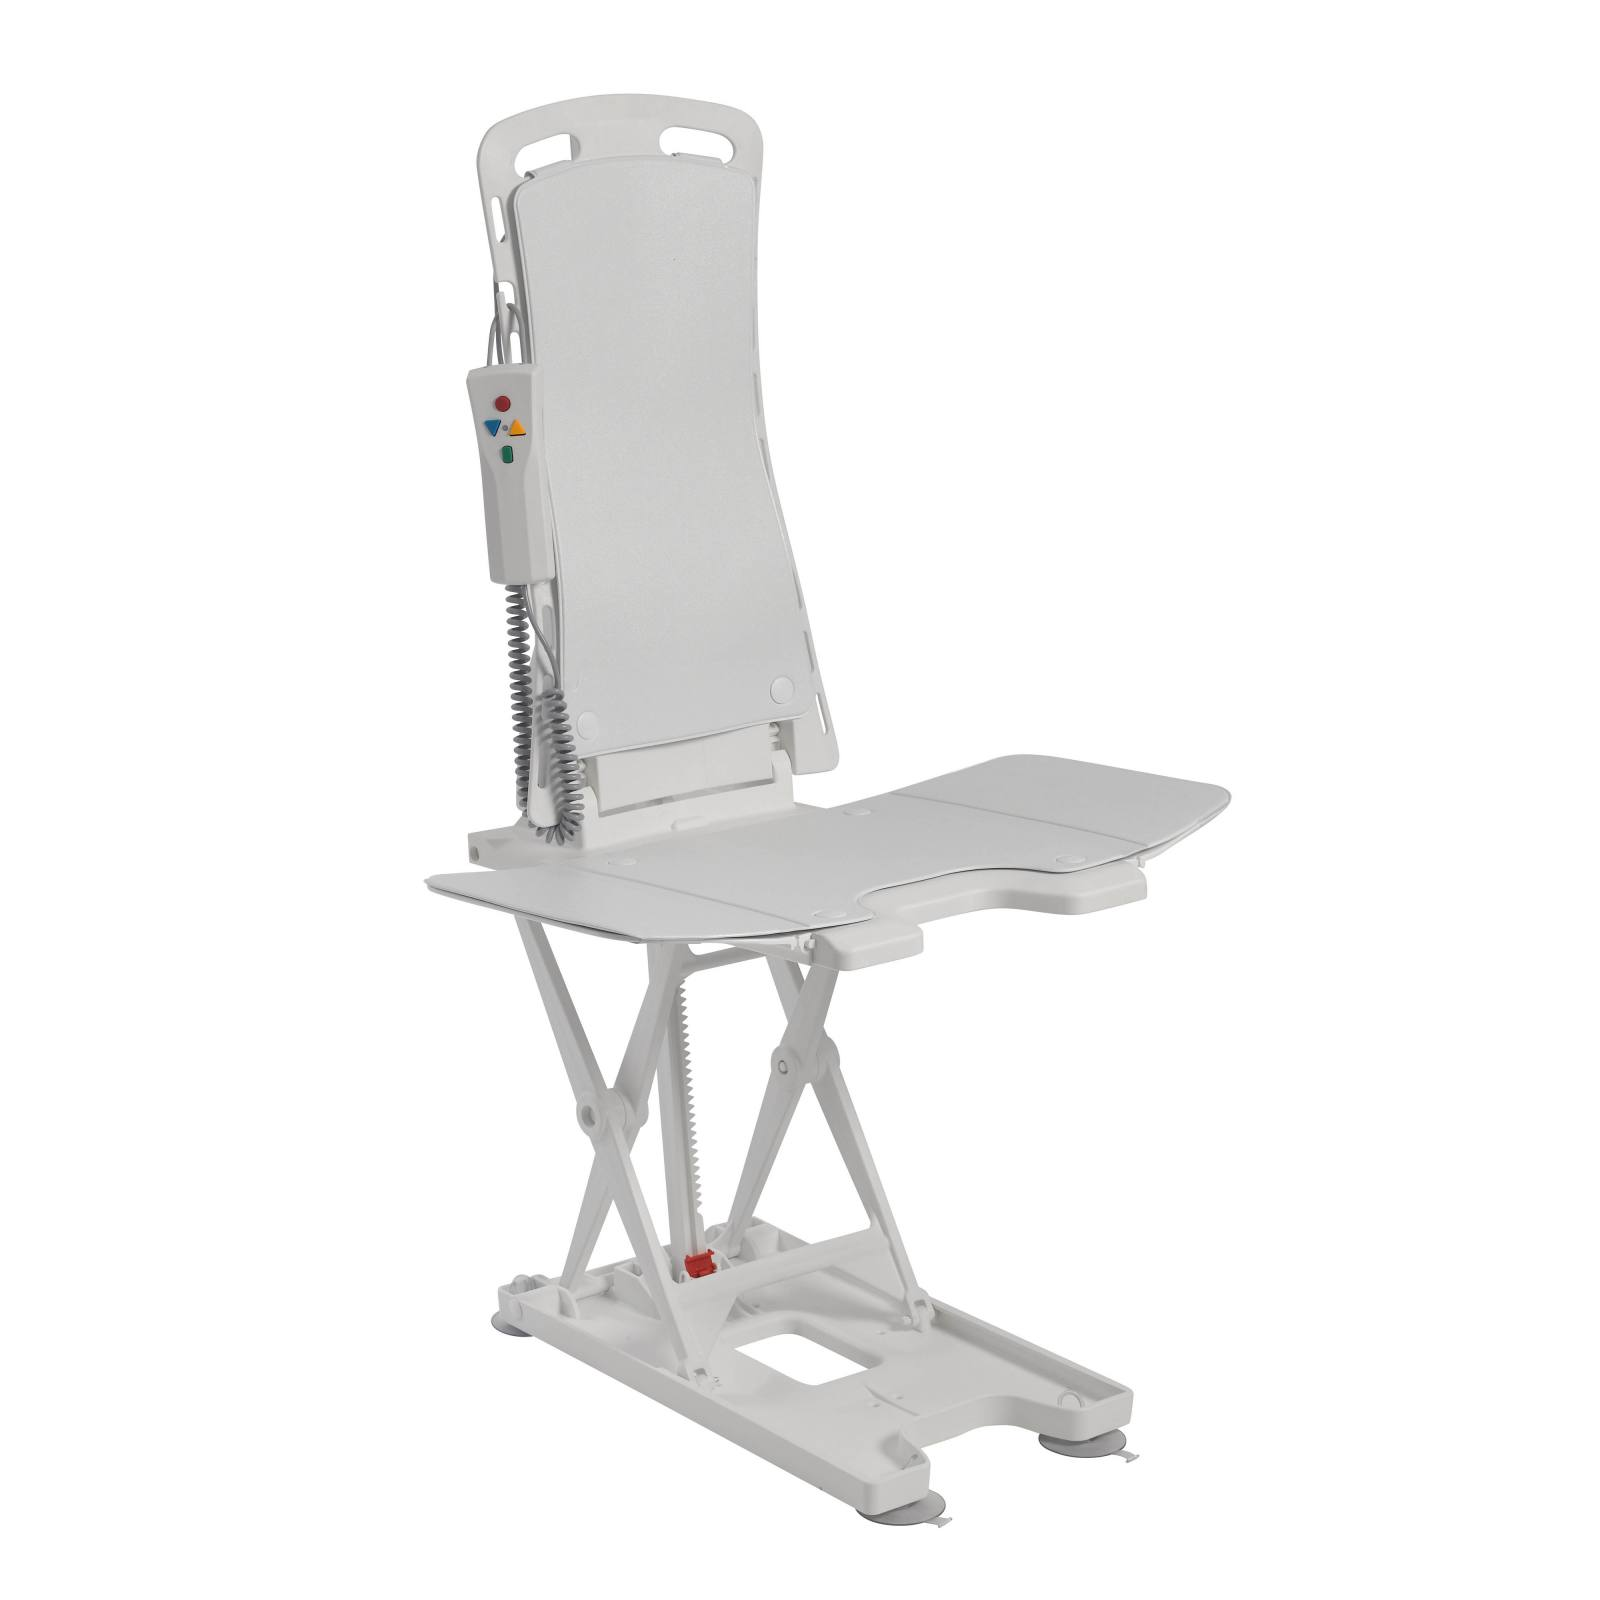 Drive Bellavita Auto Bath Tub Chair Seat Lift from Rick\'s Medical ...